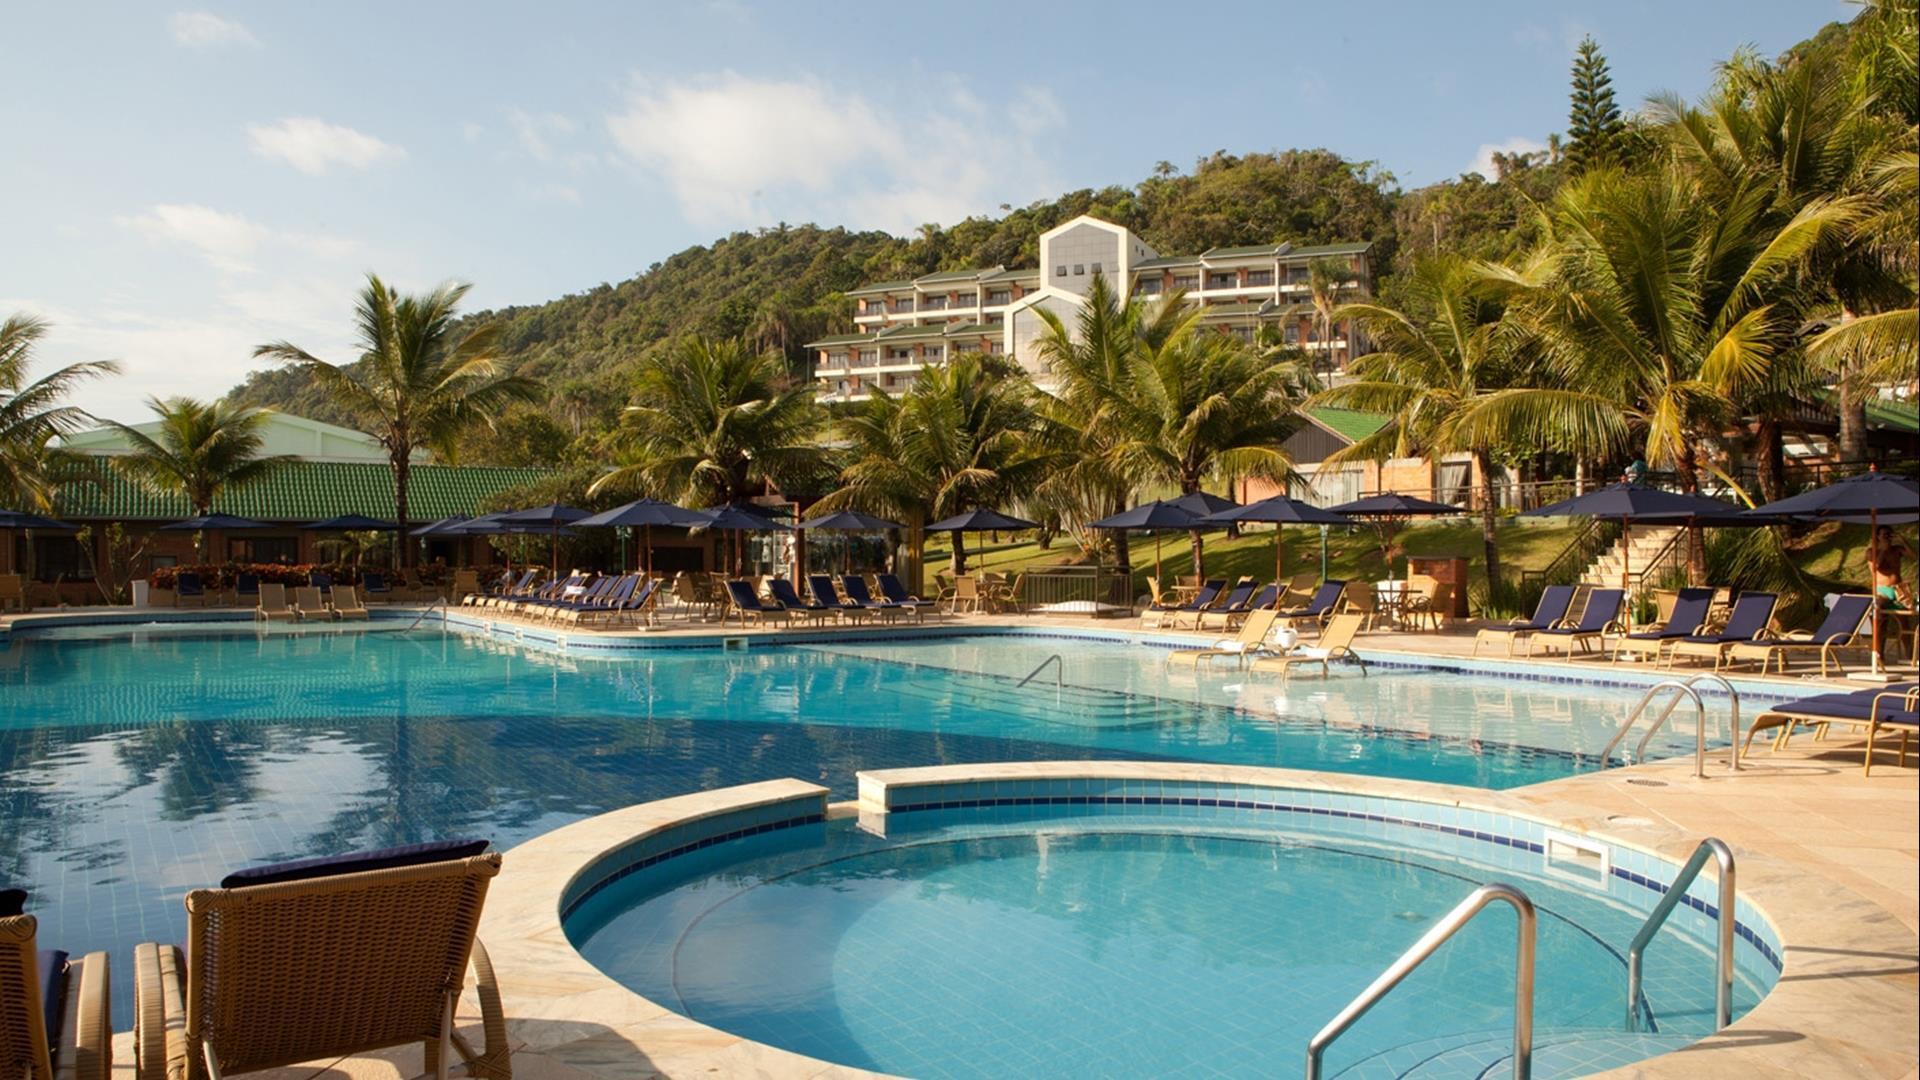 Brasilien Balneario Camboriu: Hotel - Wellness Hotel Infinity Blue